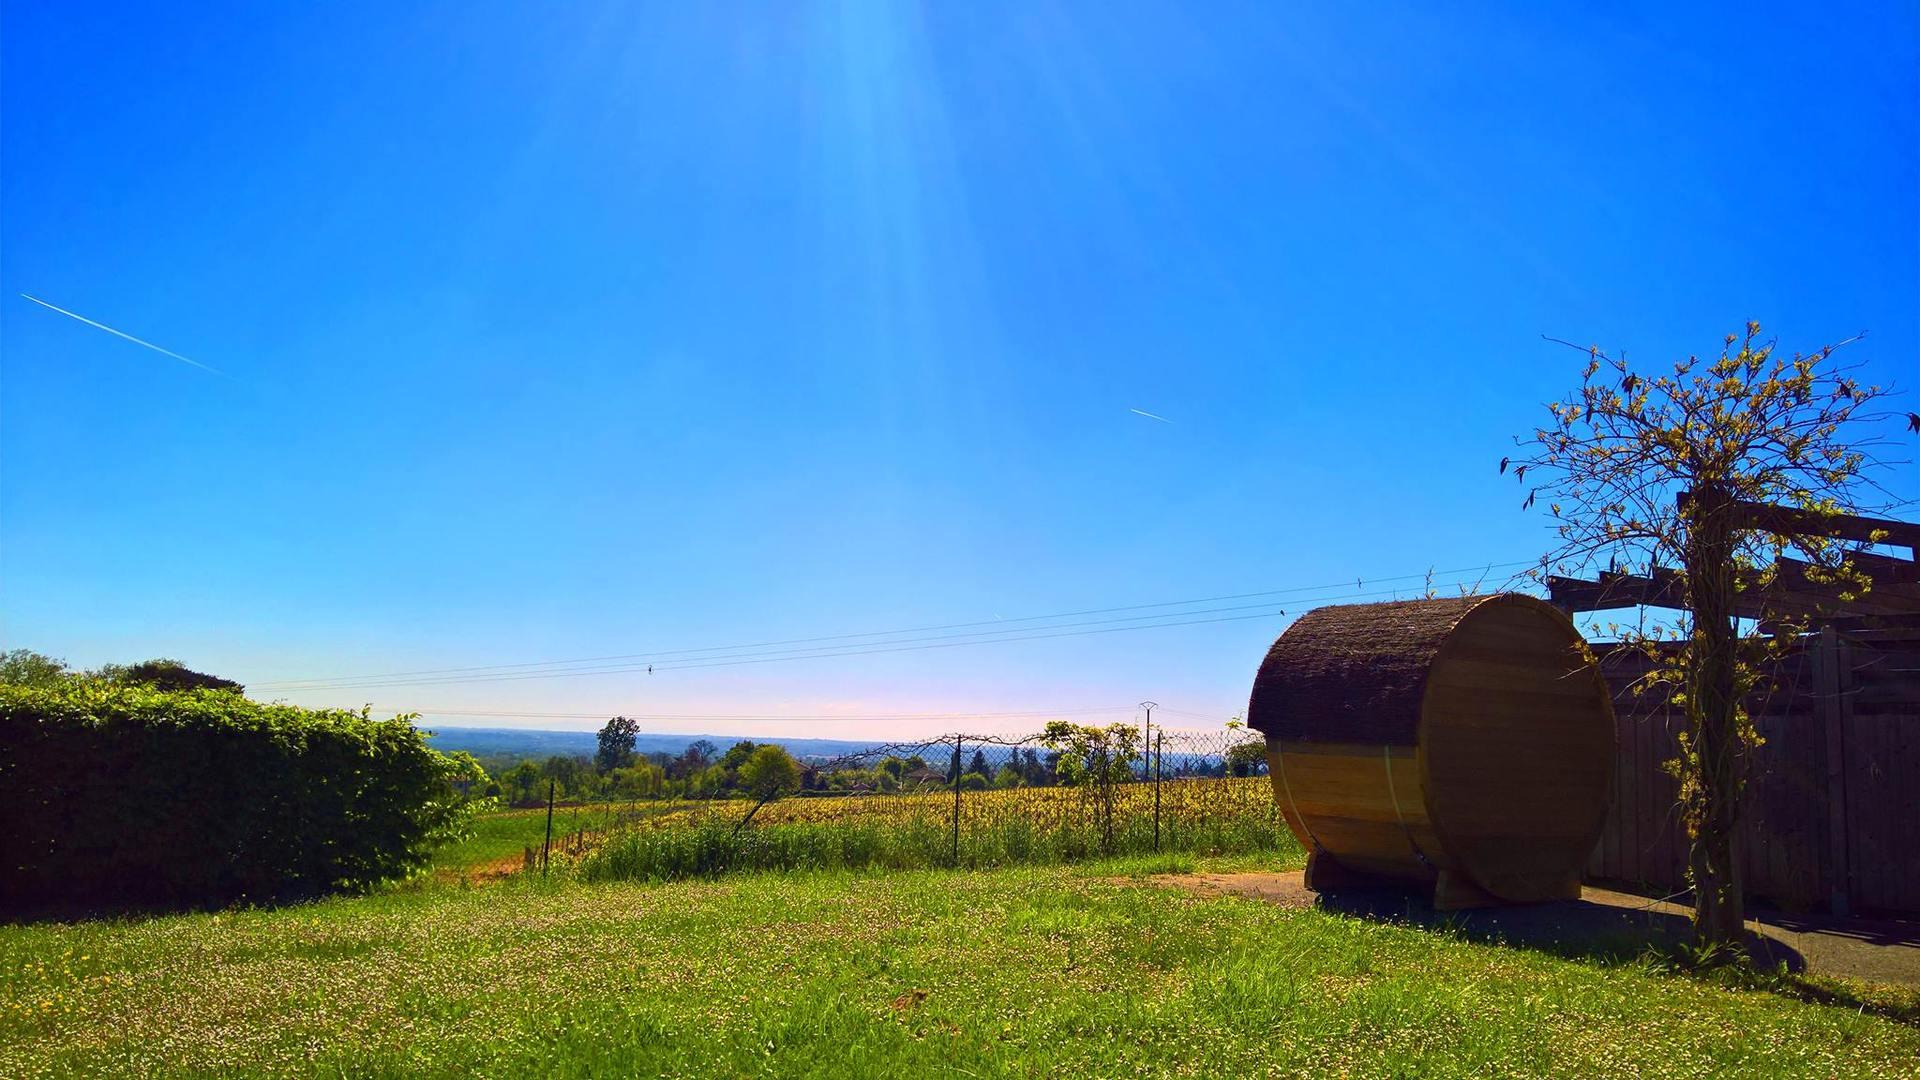 Frankrijk-Fleurie-Camping%20La%20Grappe%20Fleurie-ExtraLarge Wintersport Frankrijk|Pagina 4 van 55